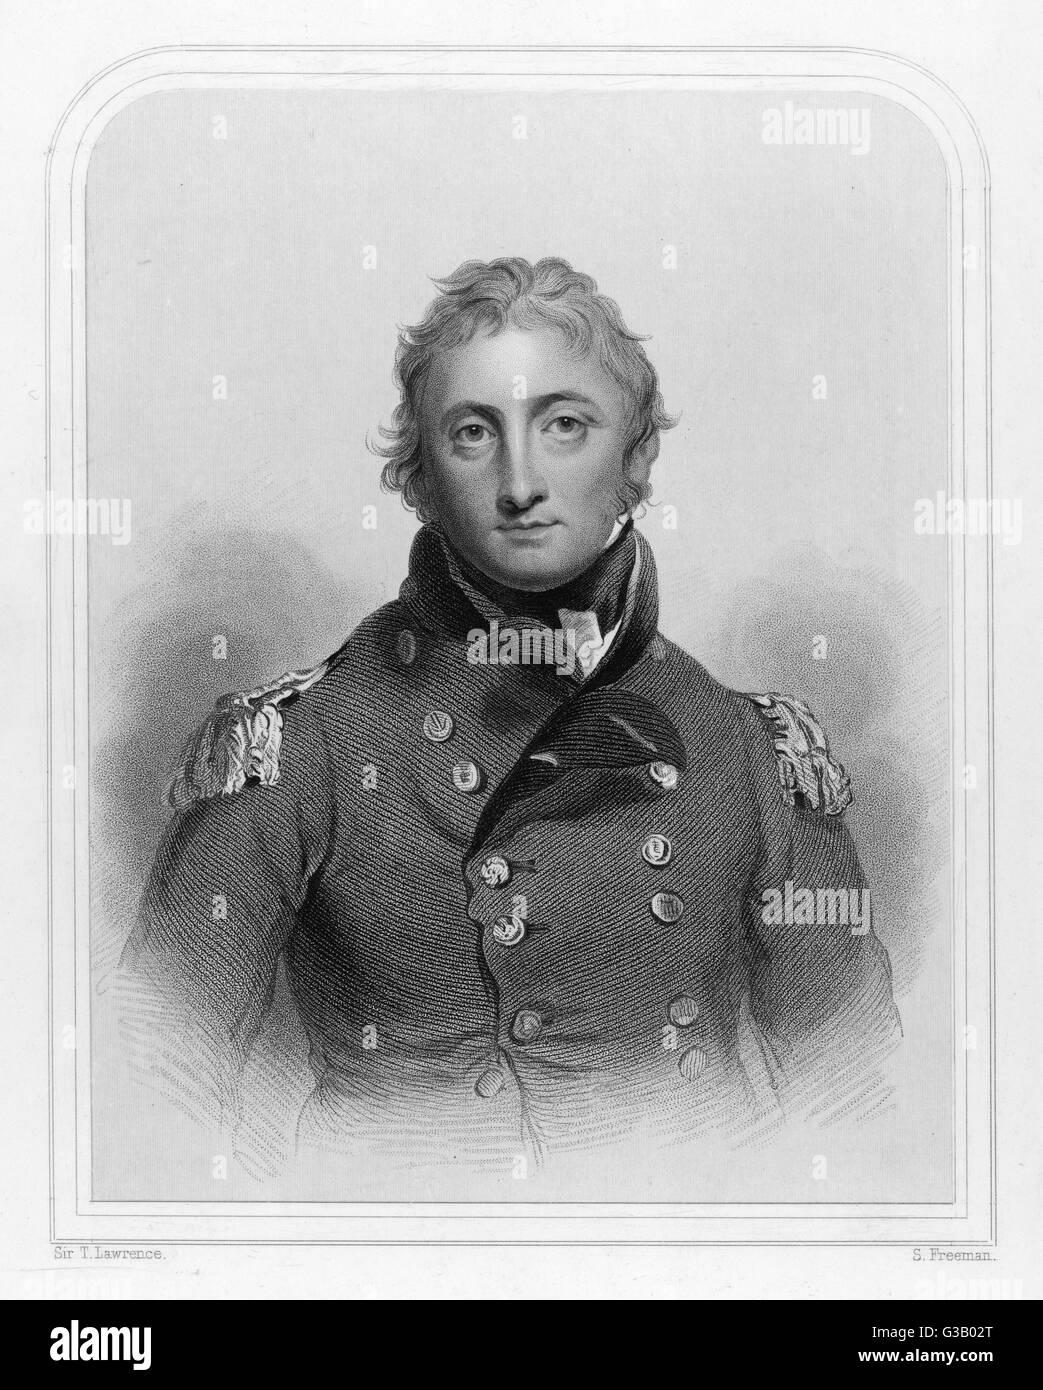 SIR JOHN MOORE Military commander, killed at  the battle of Corunna  (Peninsula campaign) and  buried darkly at Stock Photo